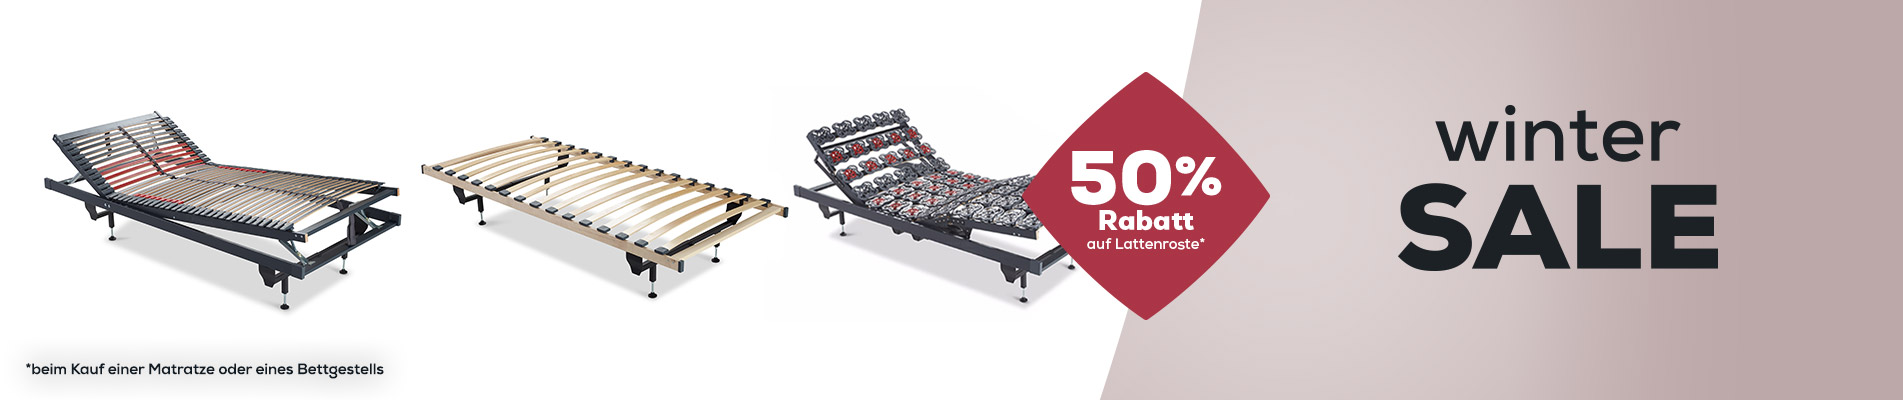 50% Rabatt auf Lattenroste - Wintersale | Swiss Sense